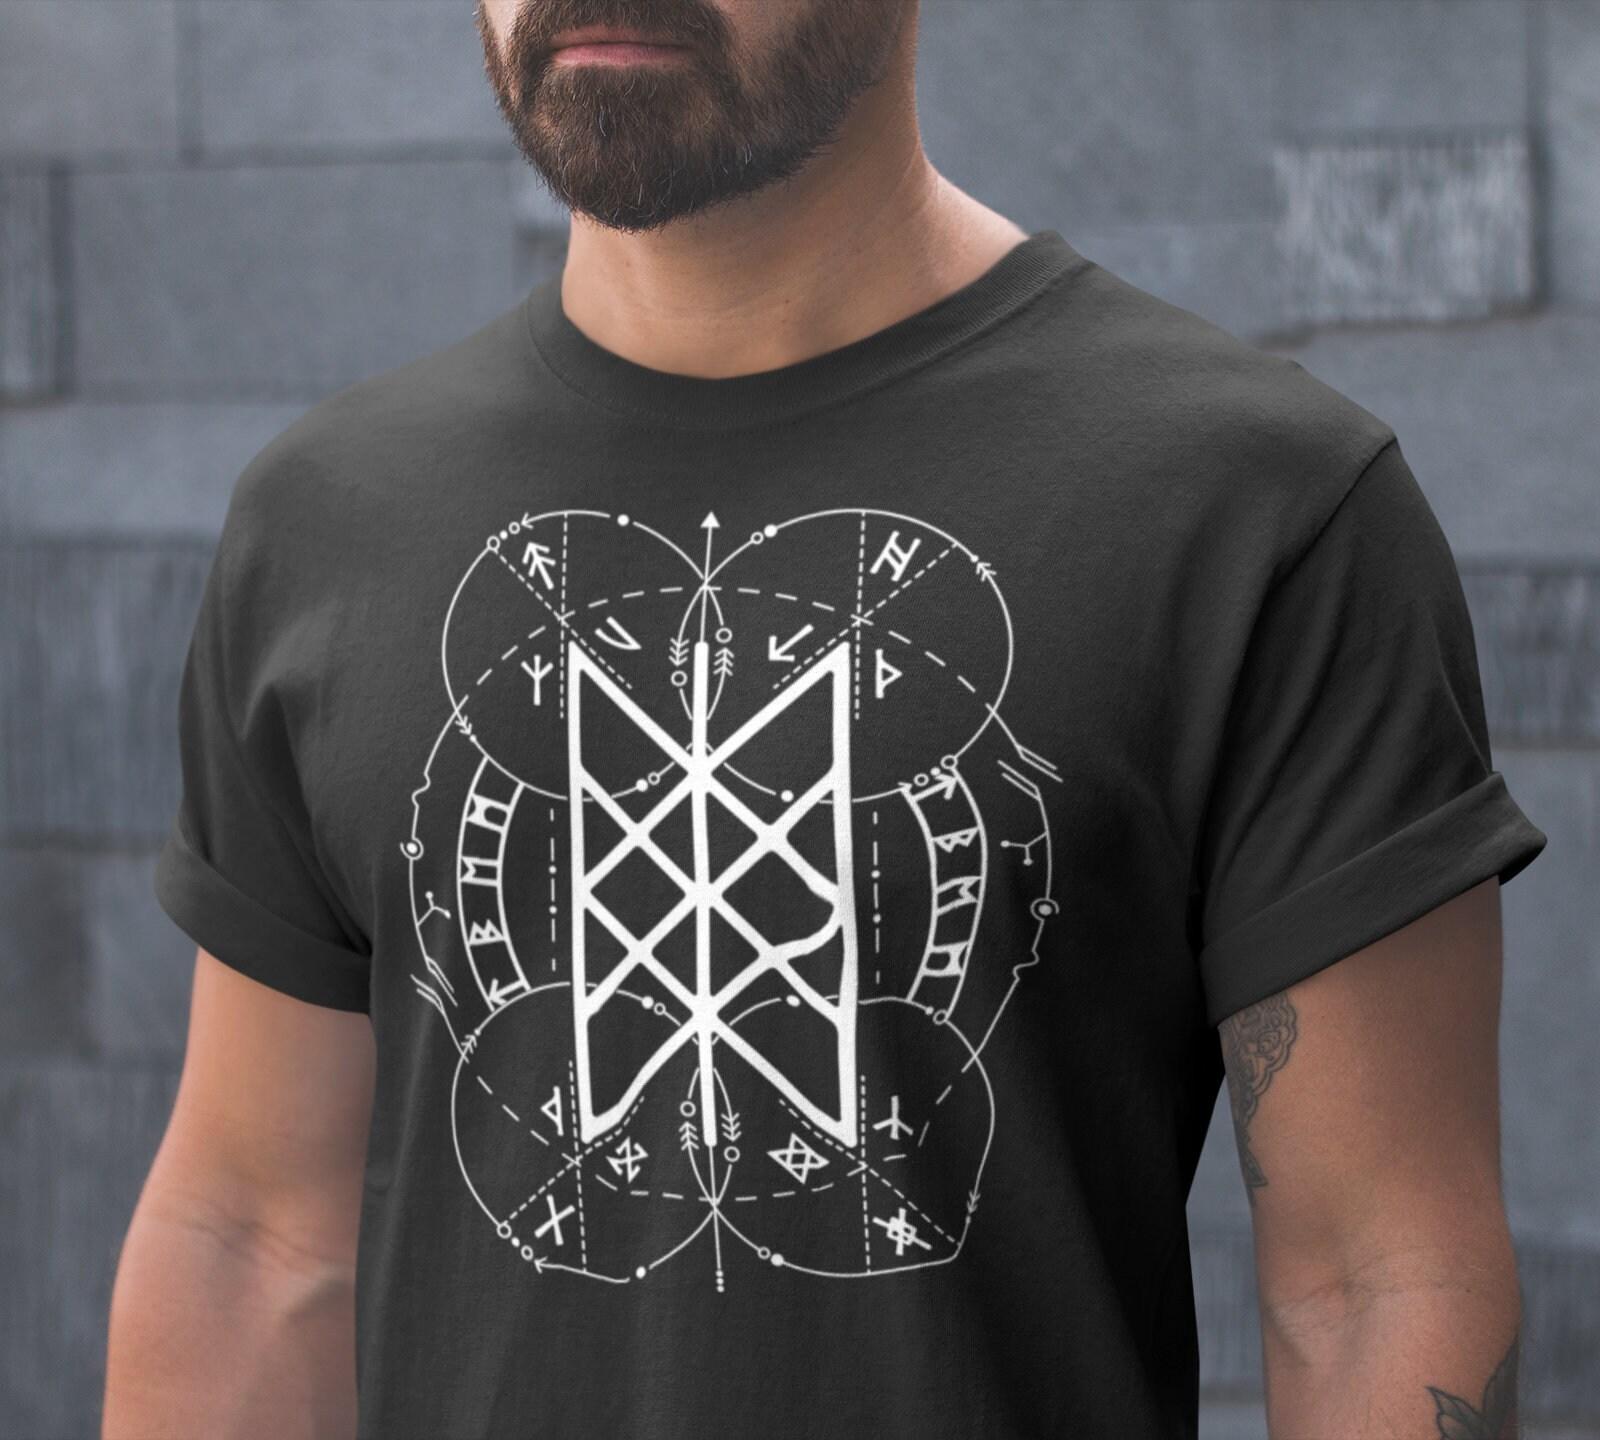 6c1dd355 Web of Wyrd | Norse Pagan Symbol | Viking T-Shirt | 3/4 Raglan Shirt |  American Apparel Tank Top | Viking Clothing | Skuld's Net | Heathen